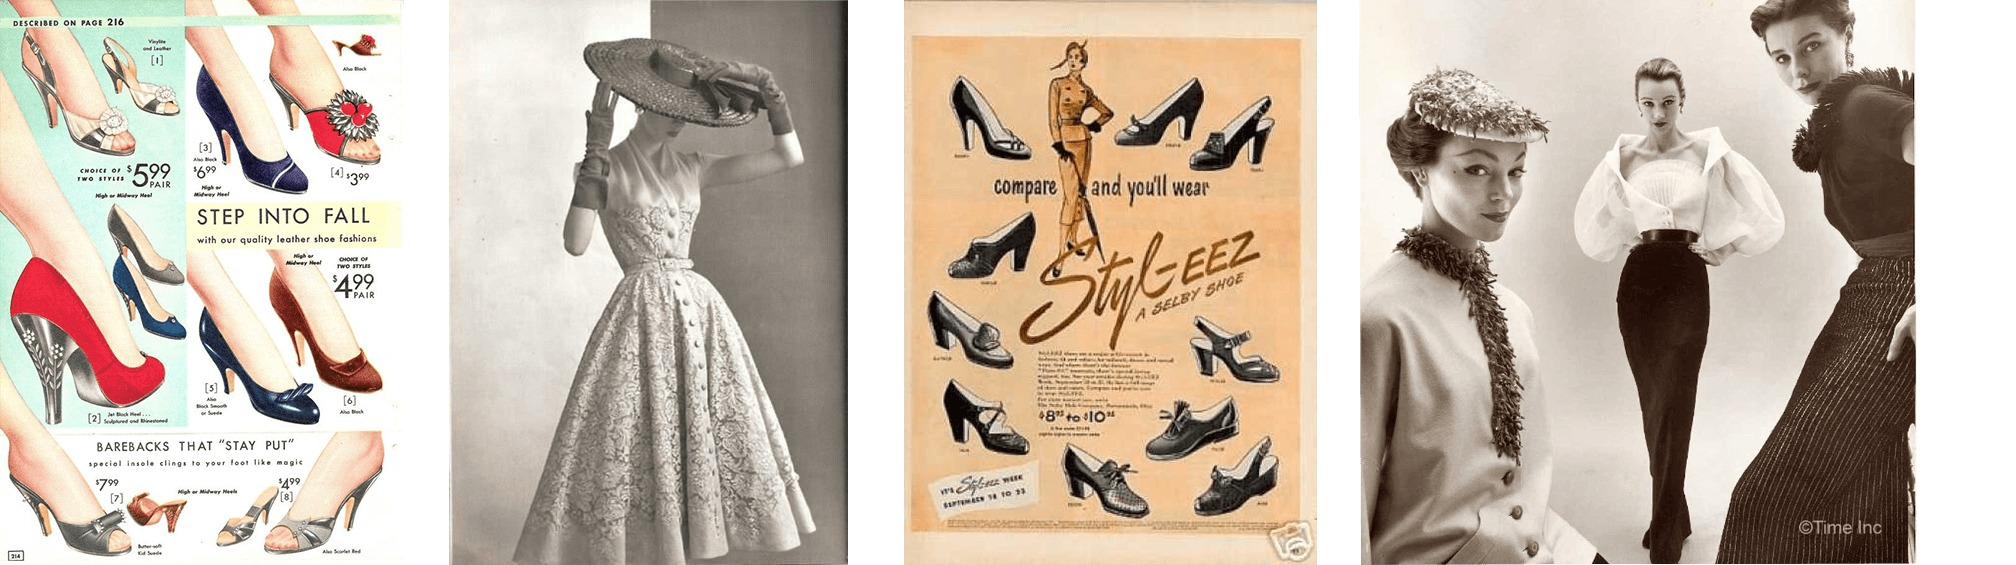 1950s Vintage Fashion